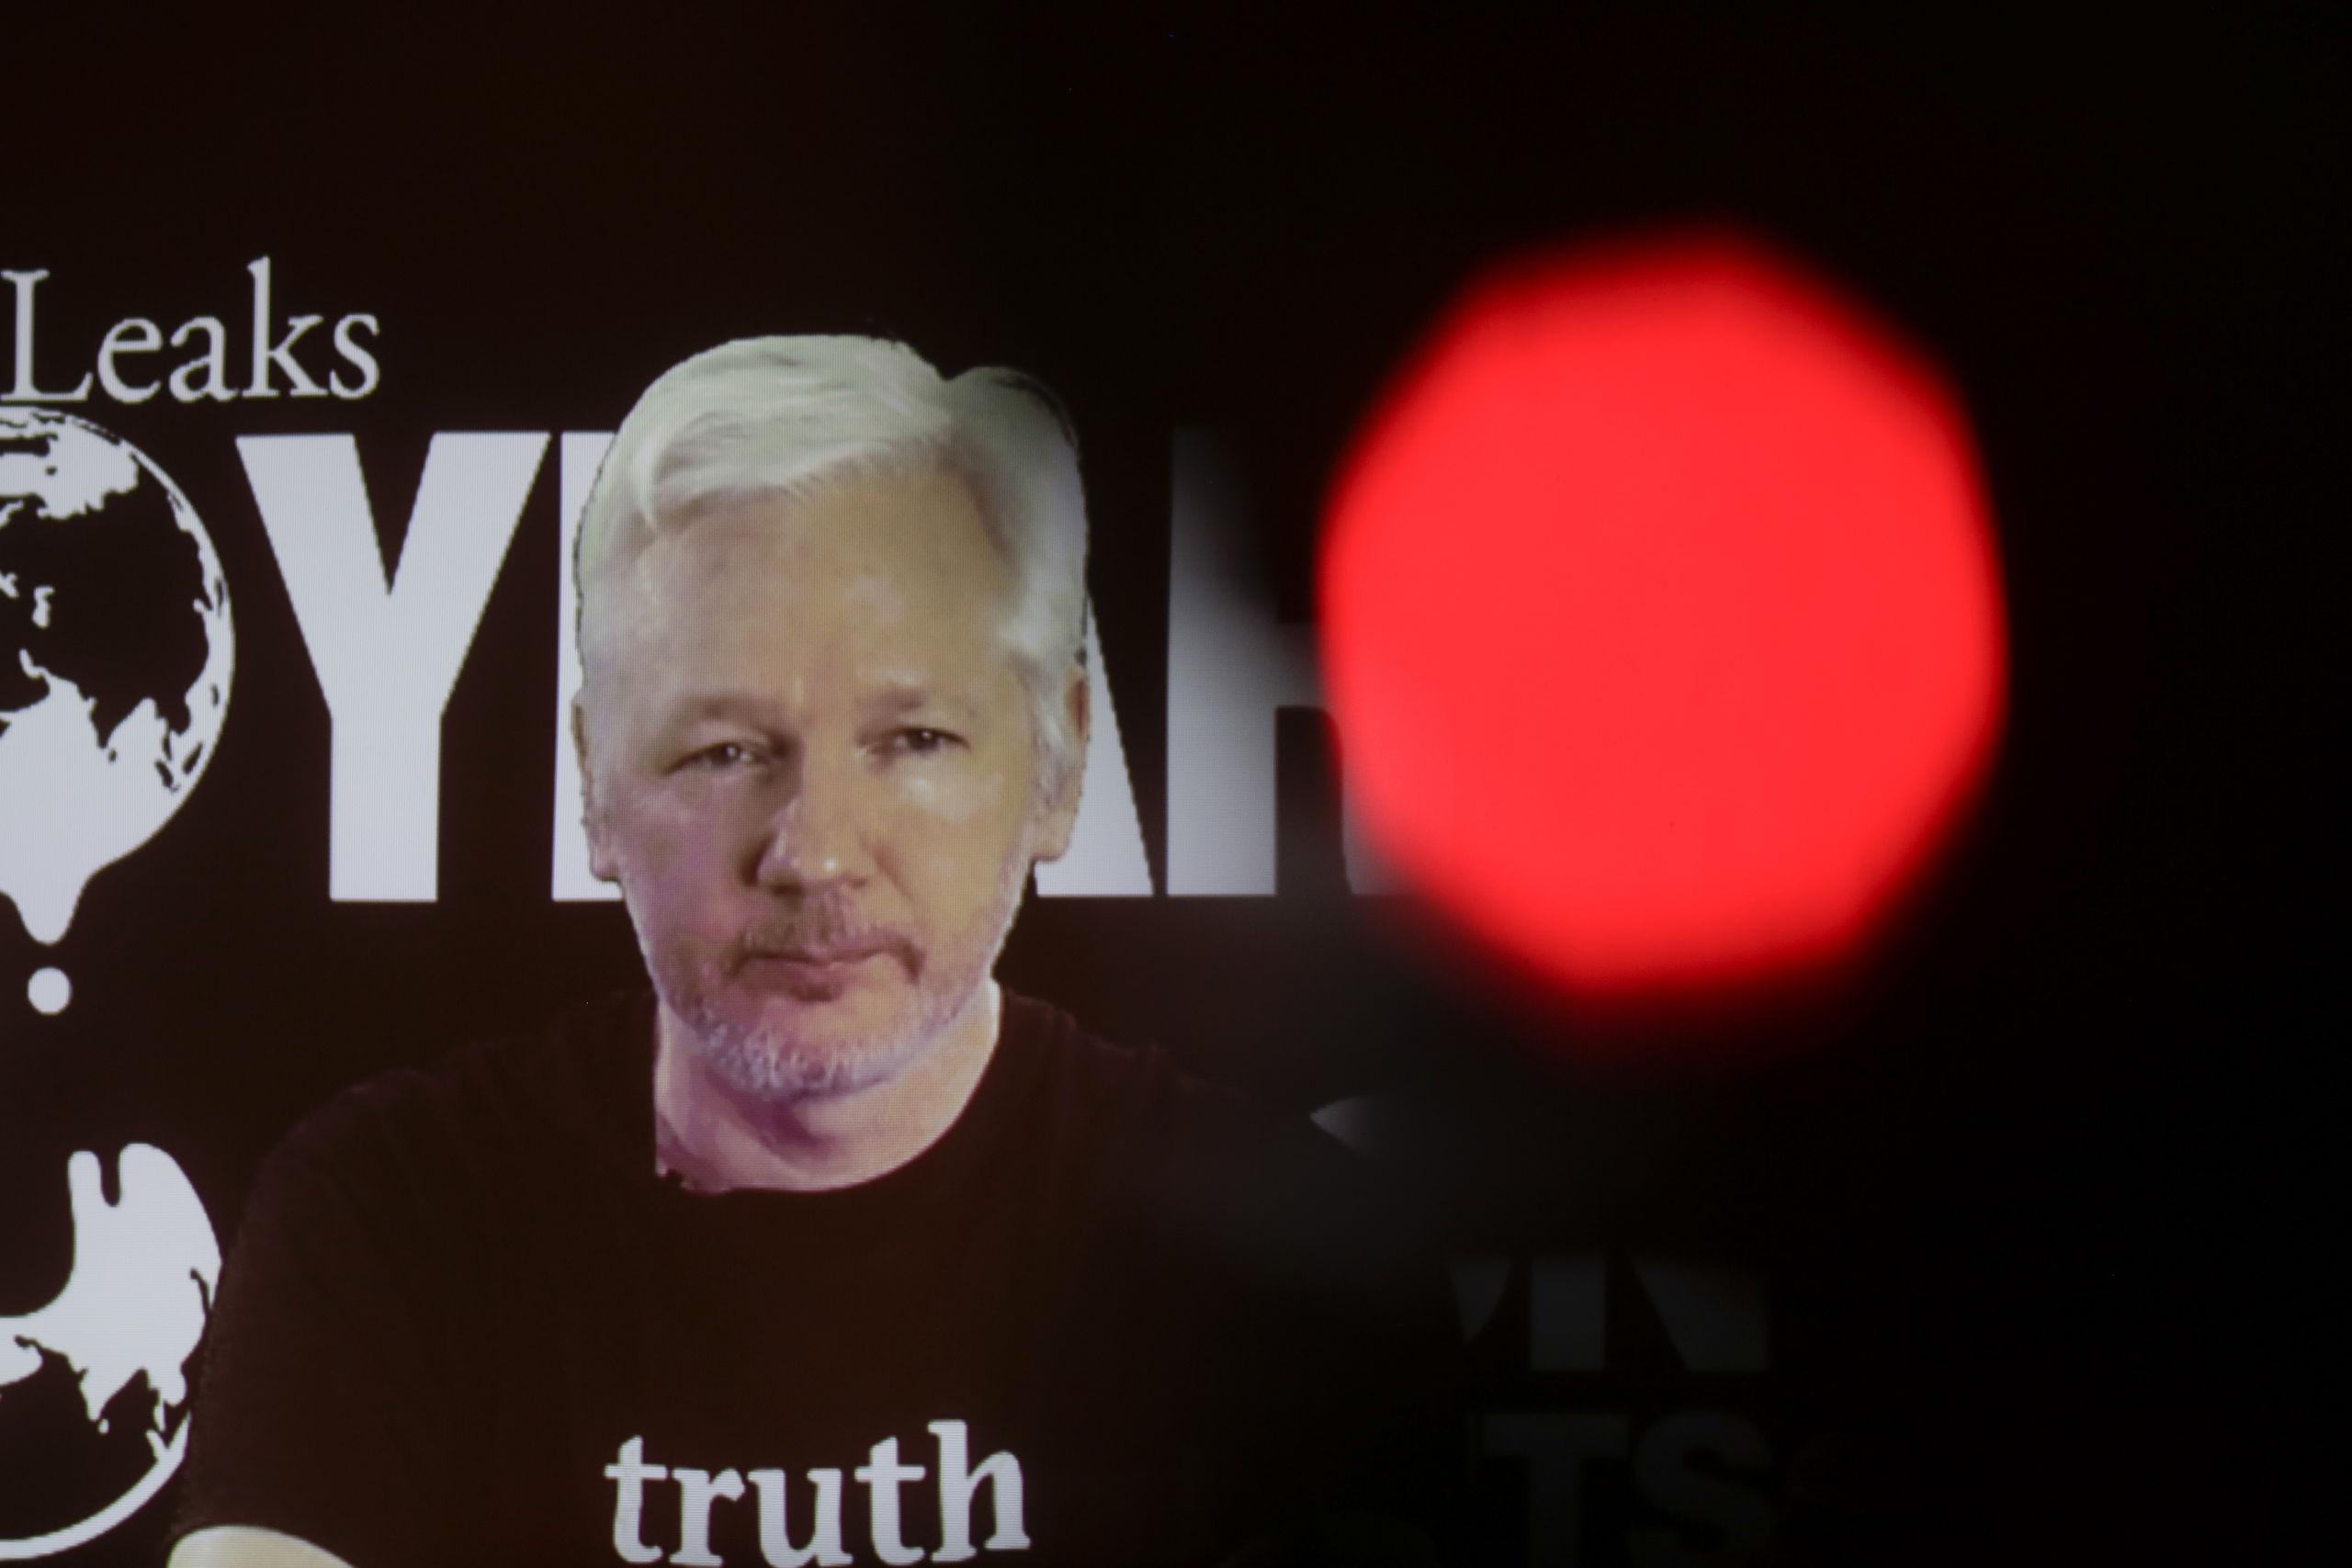 Wikileaks avslojar hemliga dokument